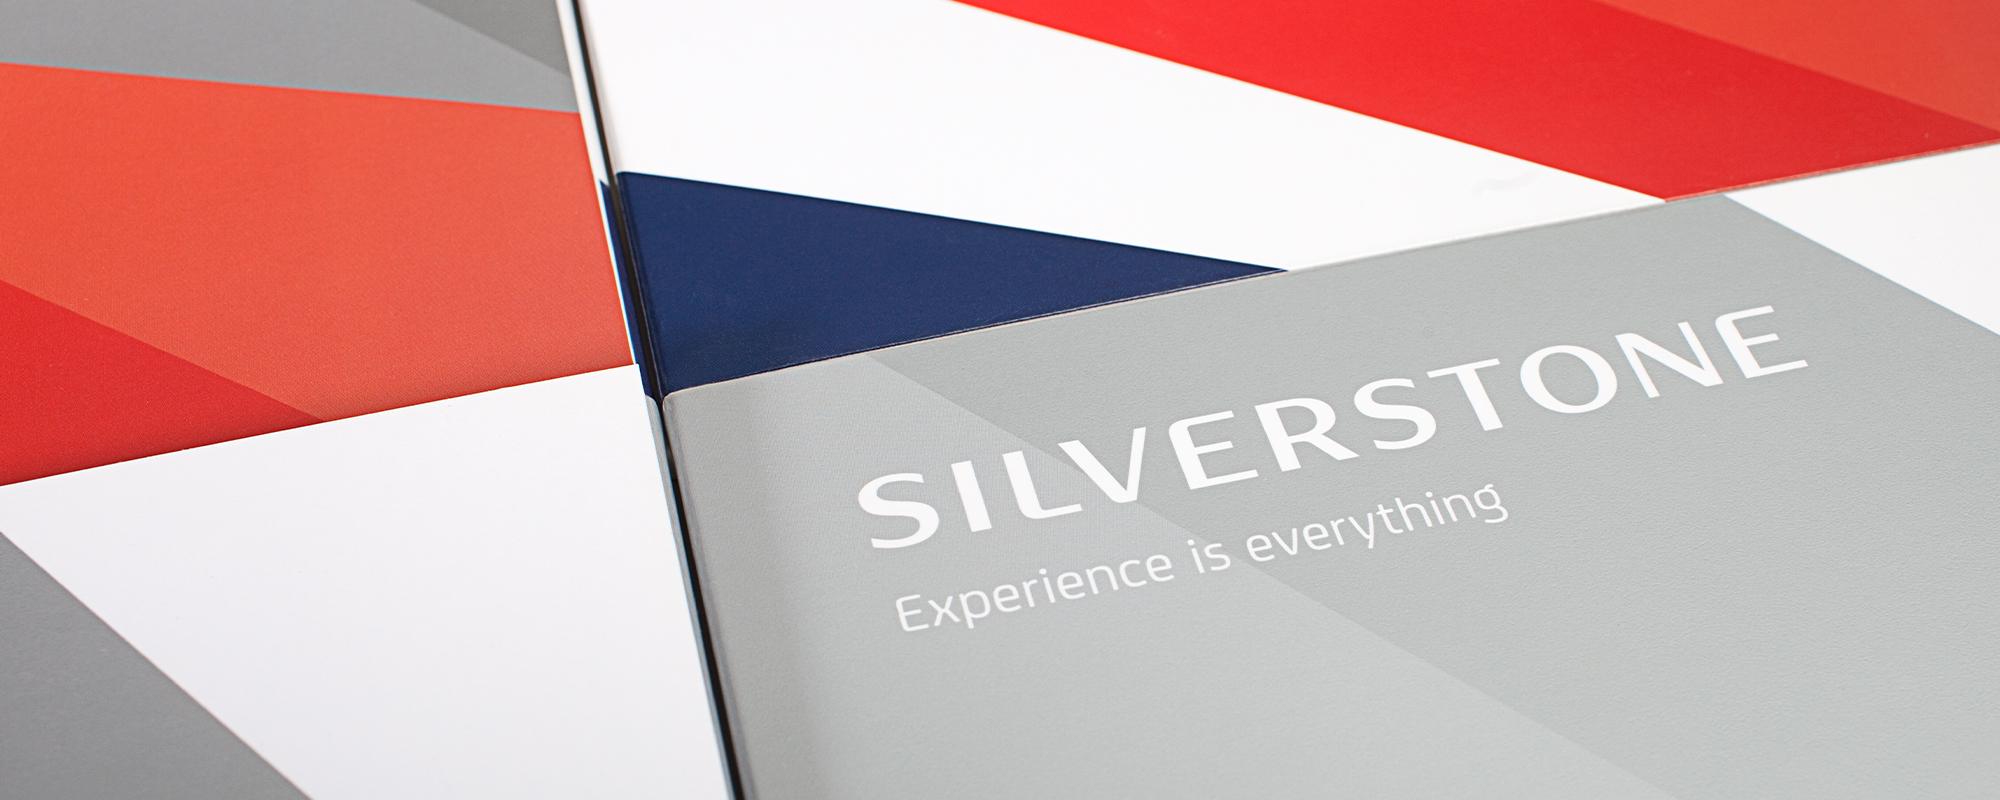 Silverstone_Rebrand_CaseStudies_BANNER3.jpg